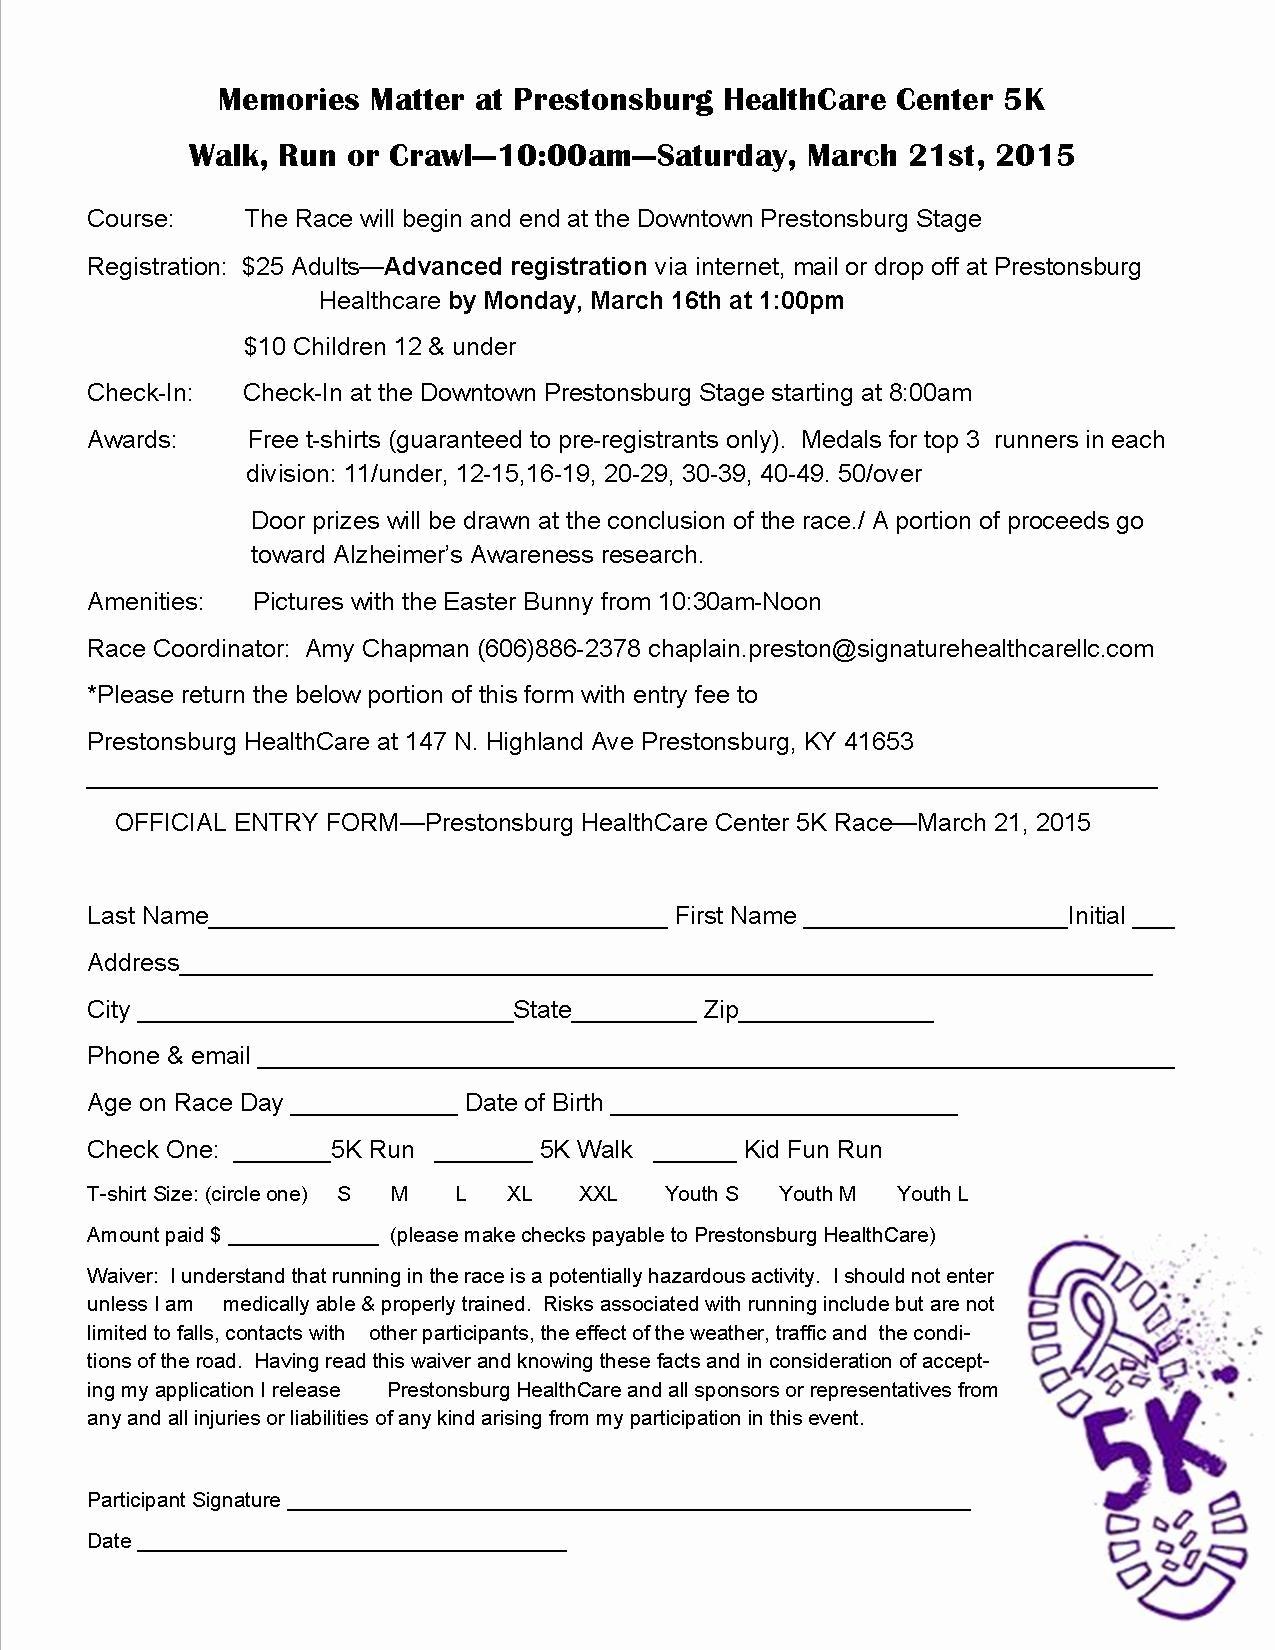 5k Registration form Template Best Of 5k Registration forms Runners Can Also Register On